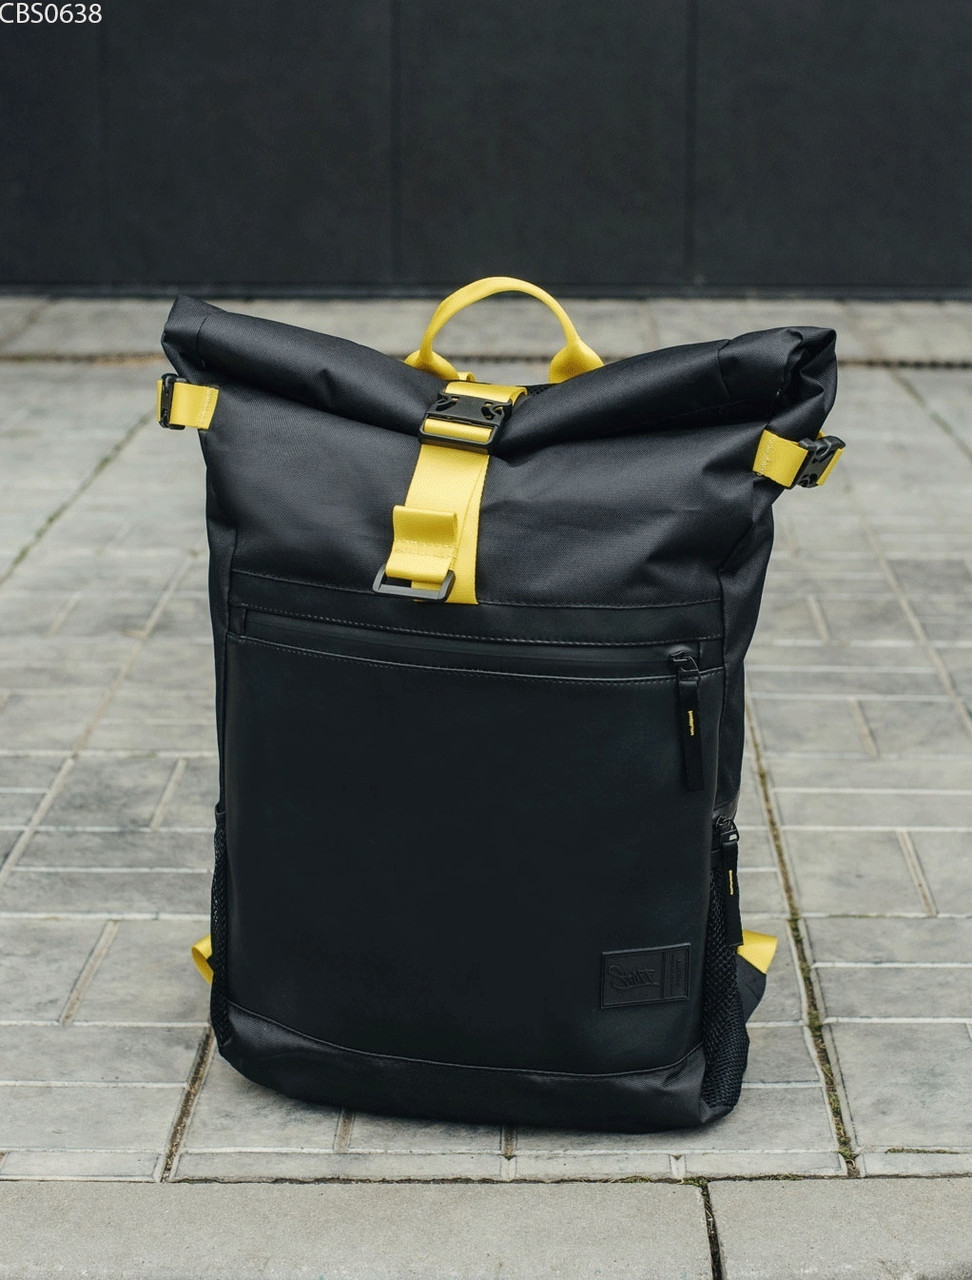 Рюкзак Staff roll black & yellow